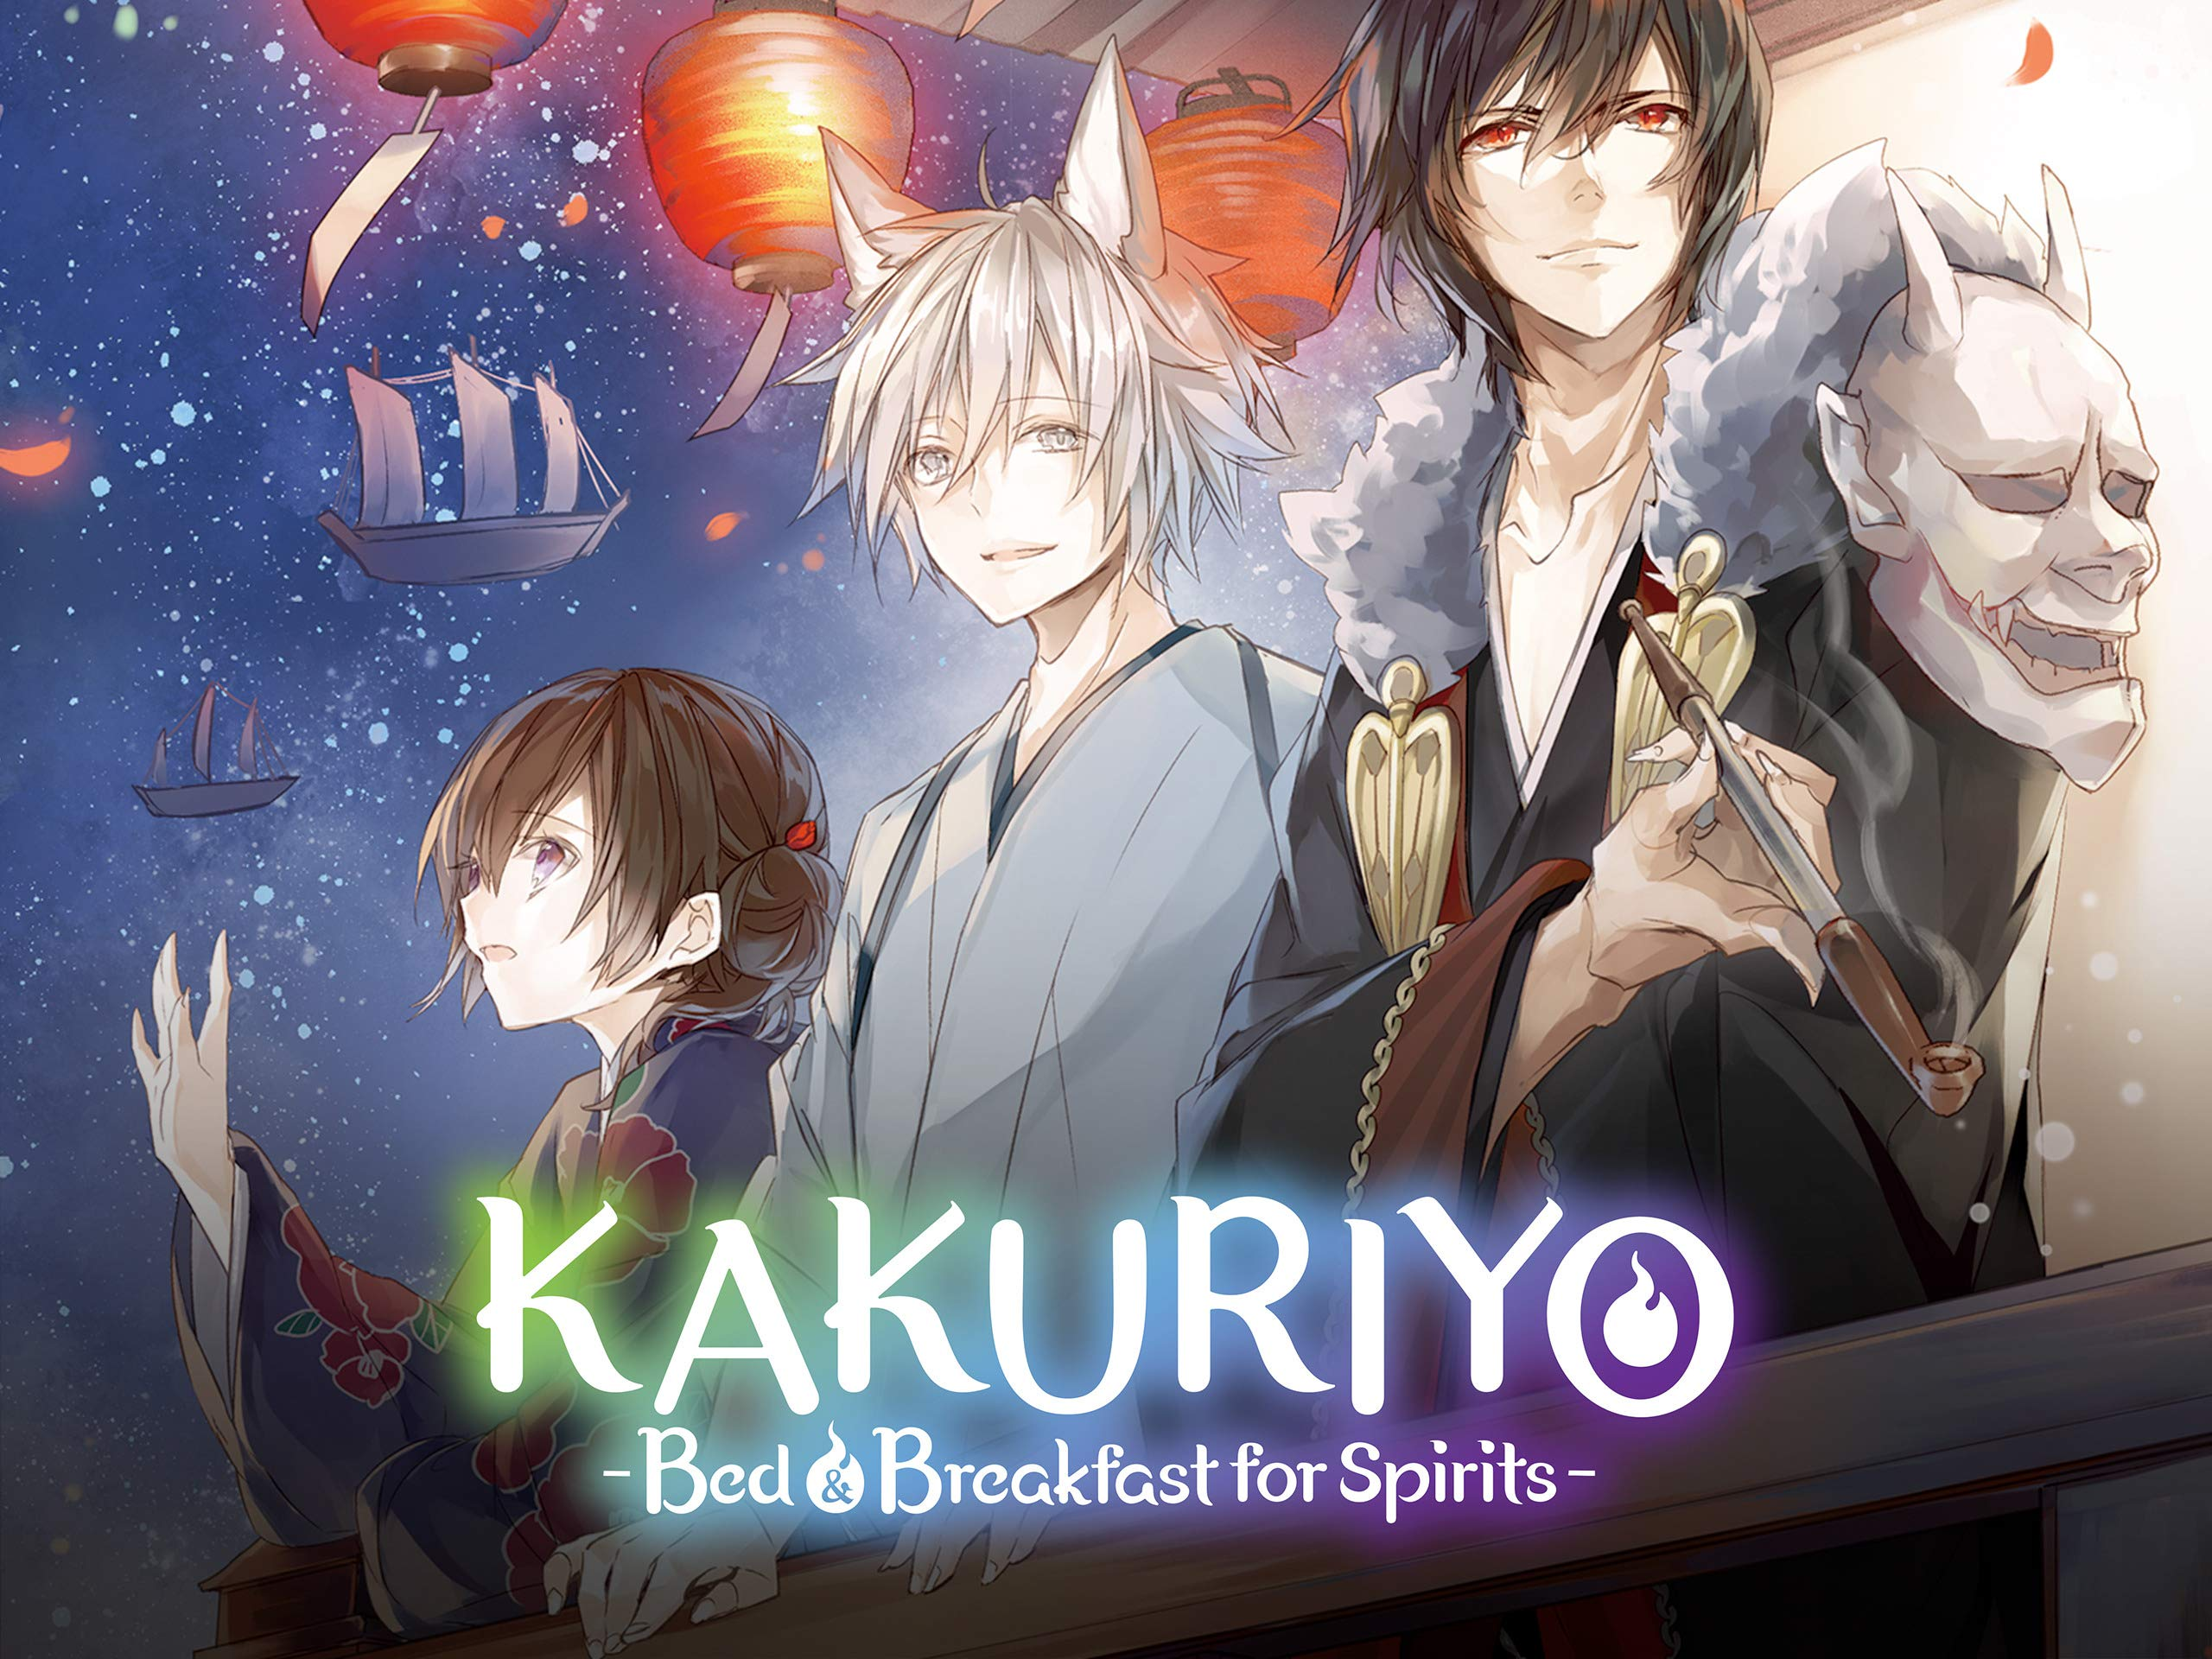 Watch Kakuriyo Bed Breakfast For Spirits Season 1 Pt 2 Prime Video Related to unscaled merfolk, fish people, beast man, humanoid abomination, animalistic abomination. watch kakuriyo bed breakfast for